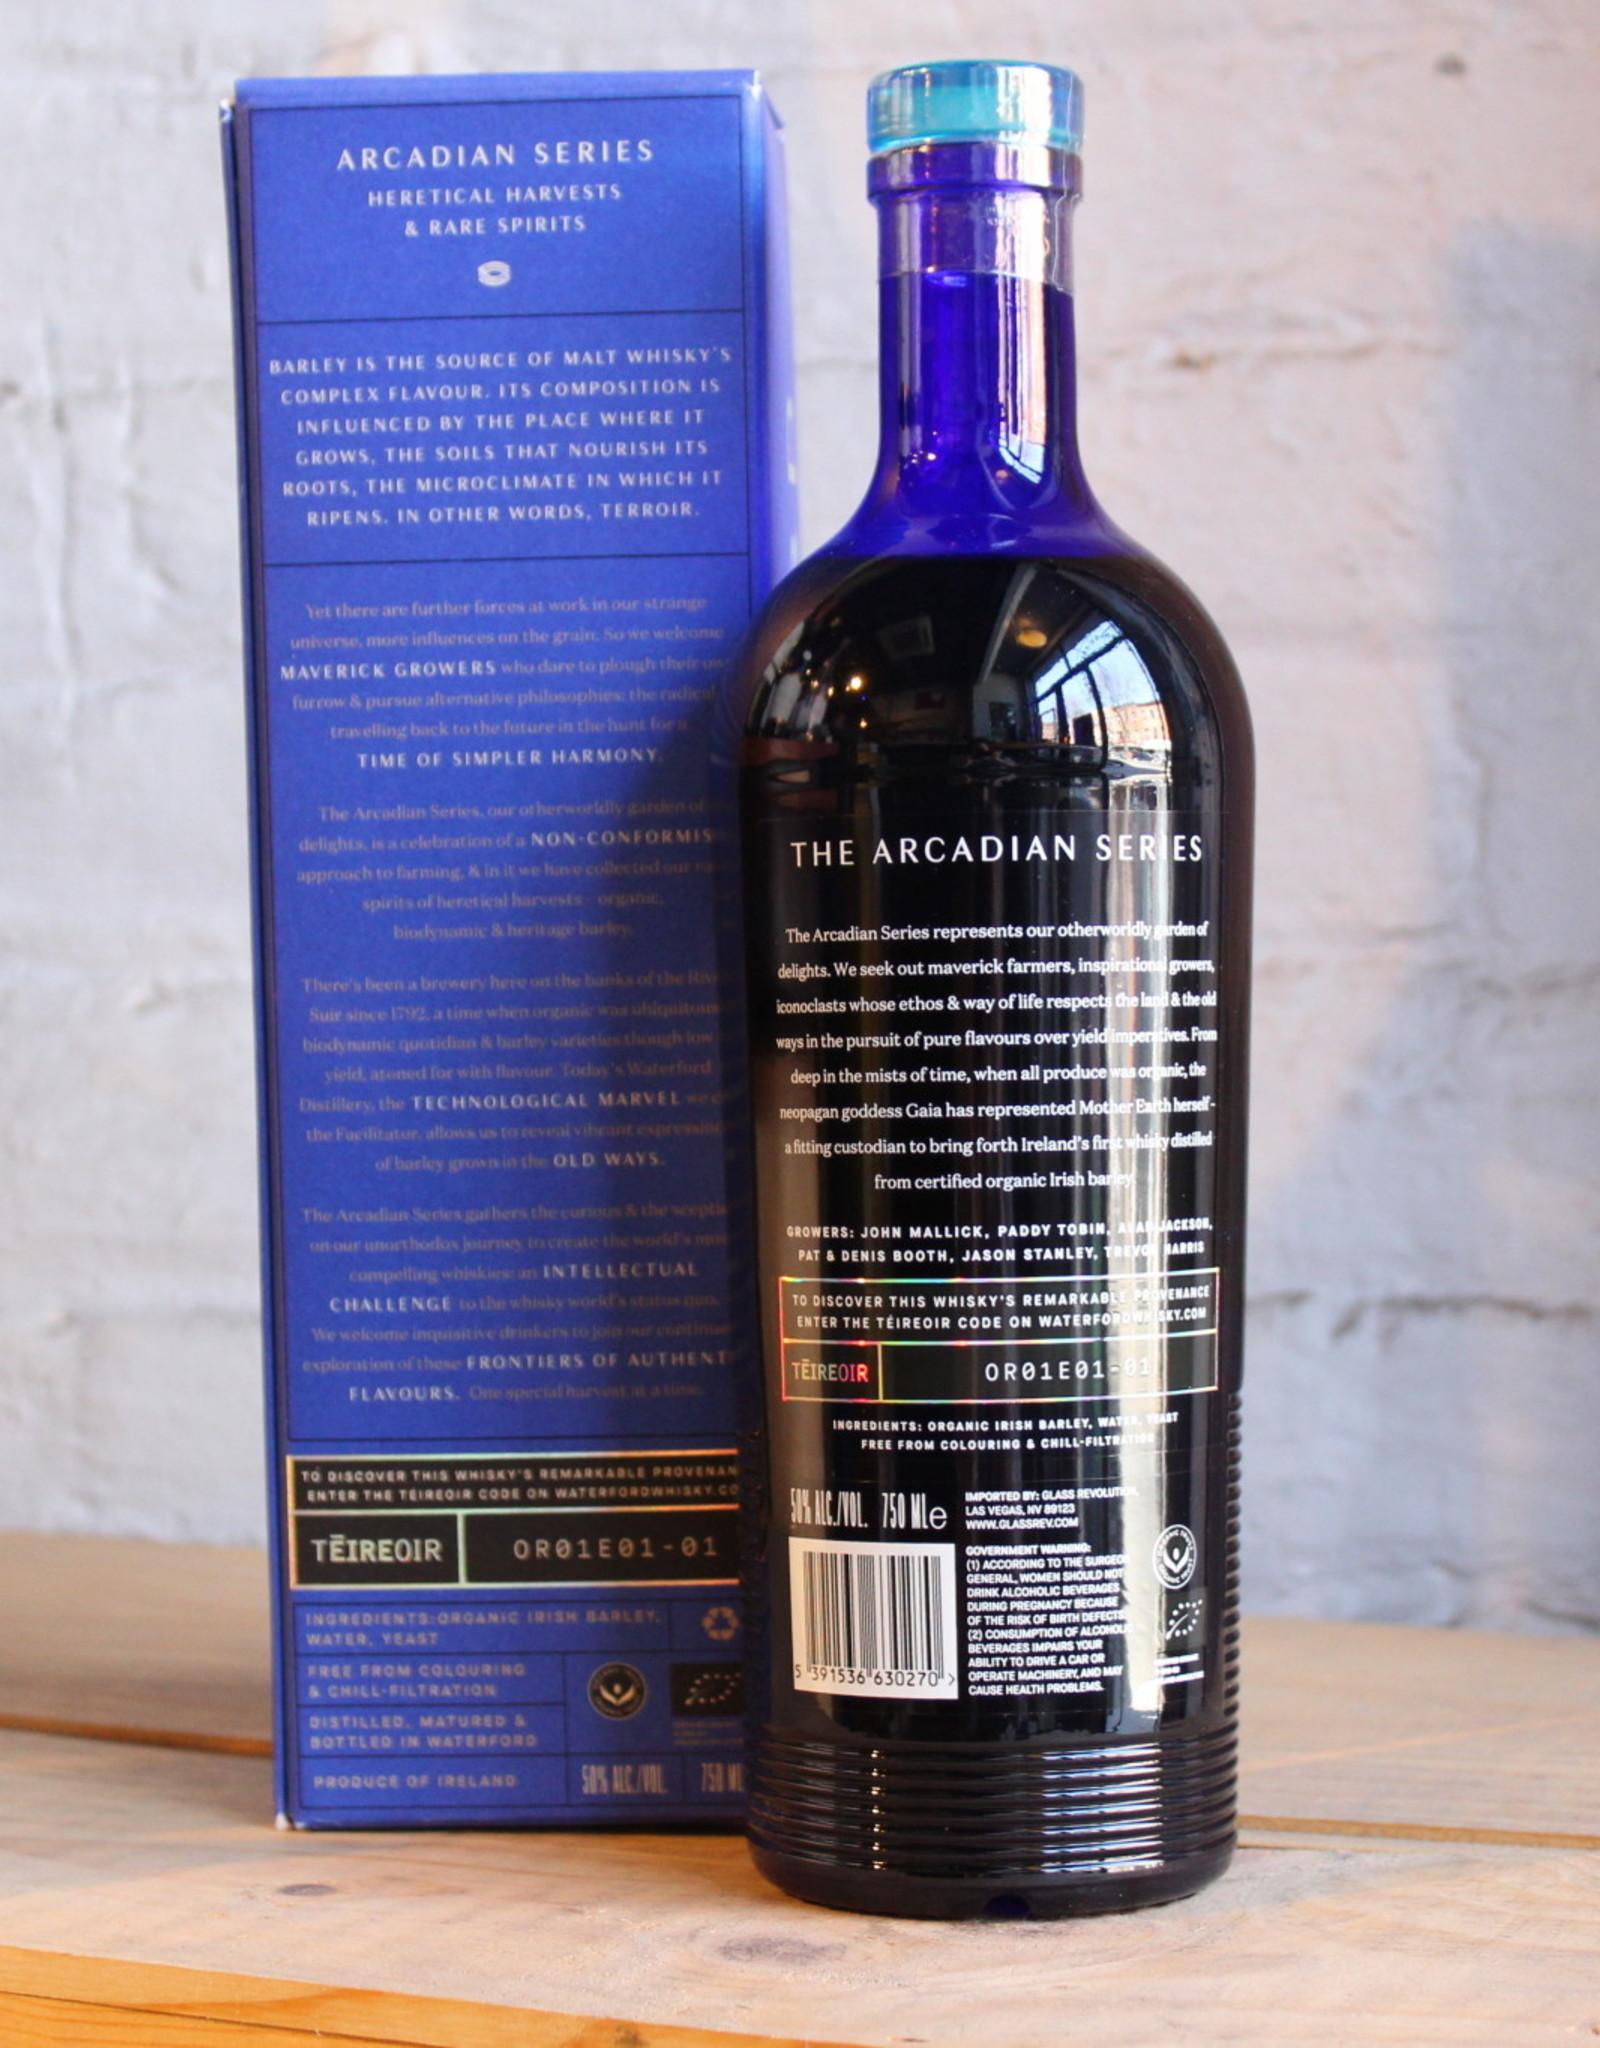 Waterford Distillery Gaia Organic Irish Single Malt Whisky Edition 1.1 - Ireland  (750ml)